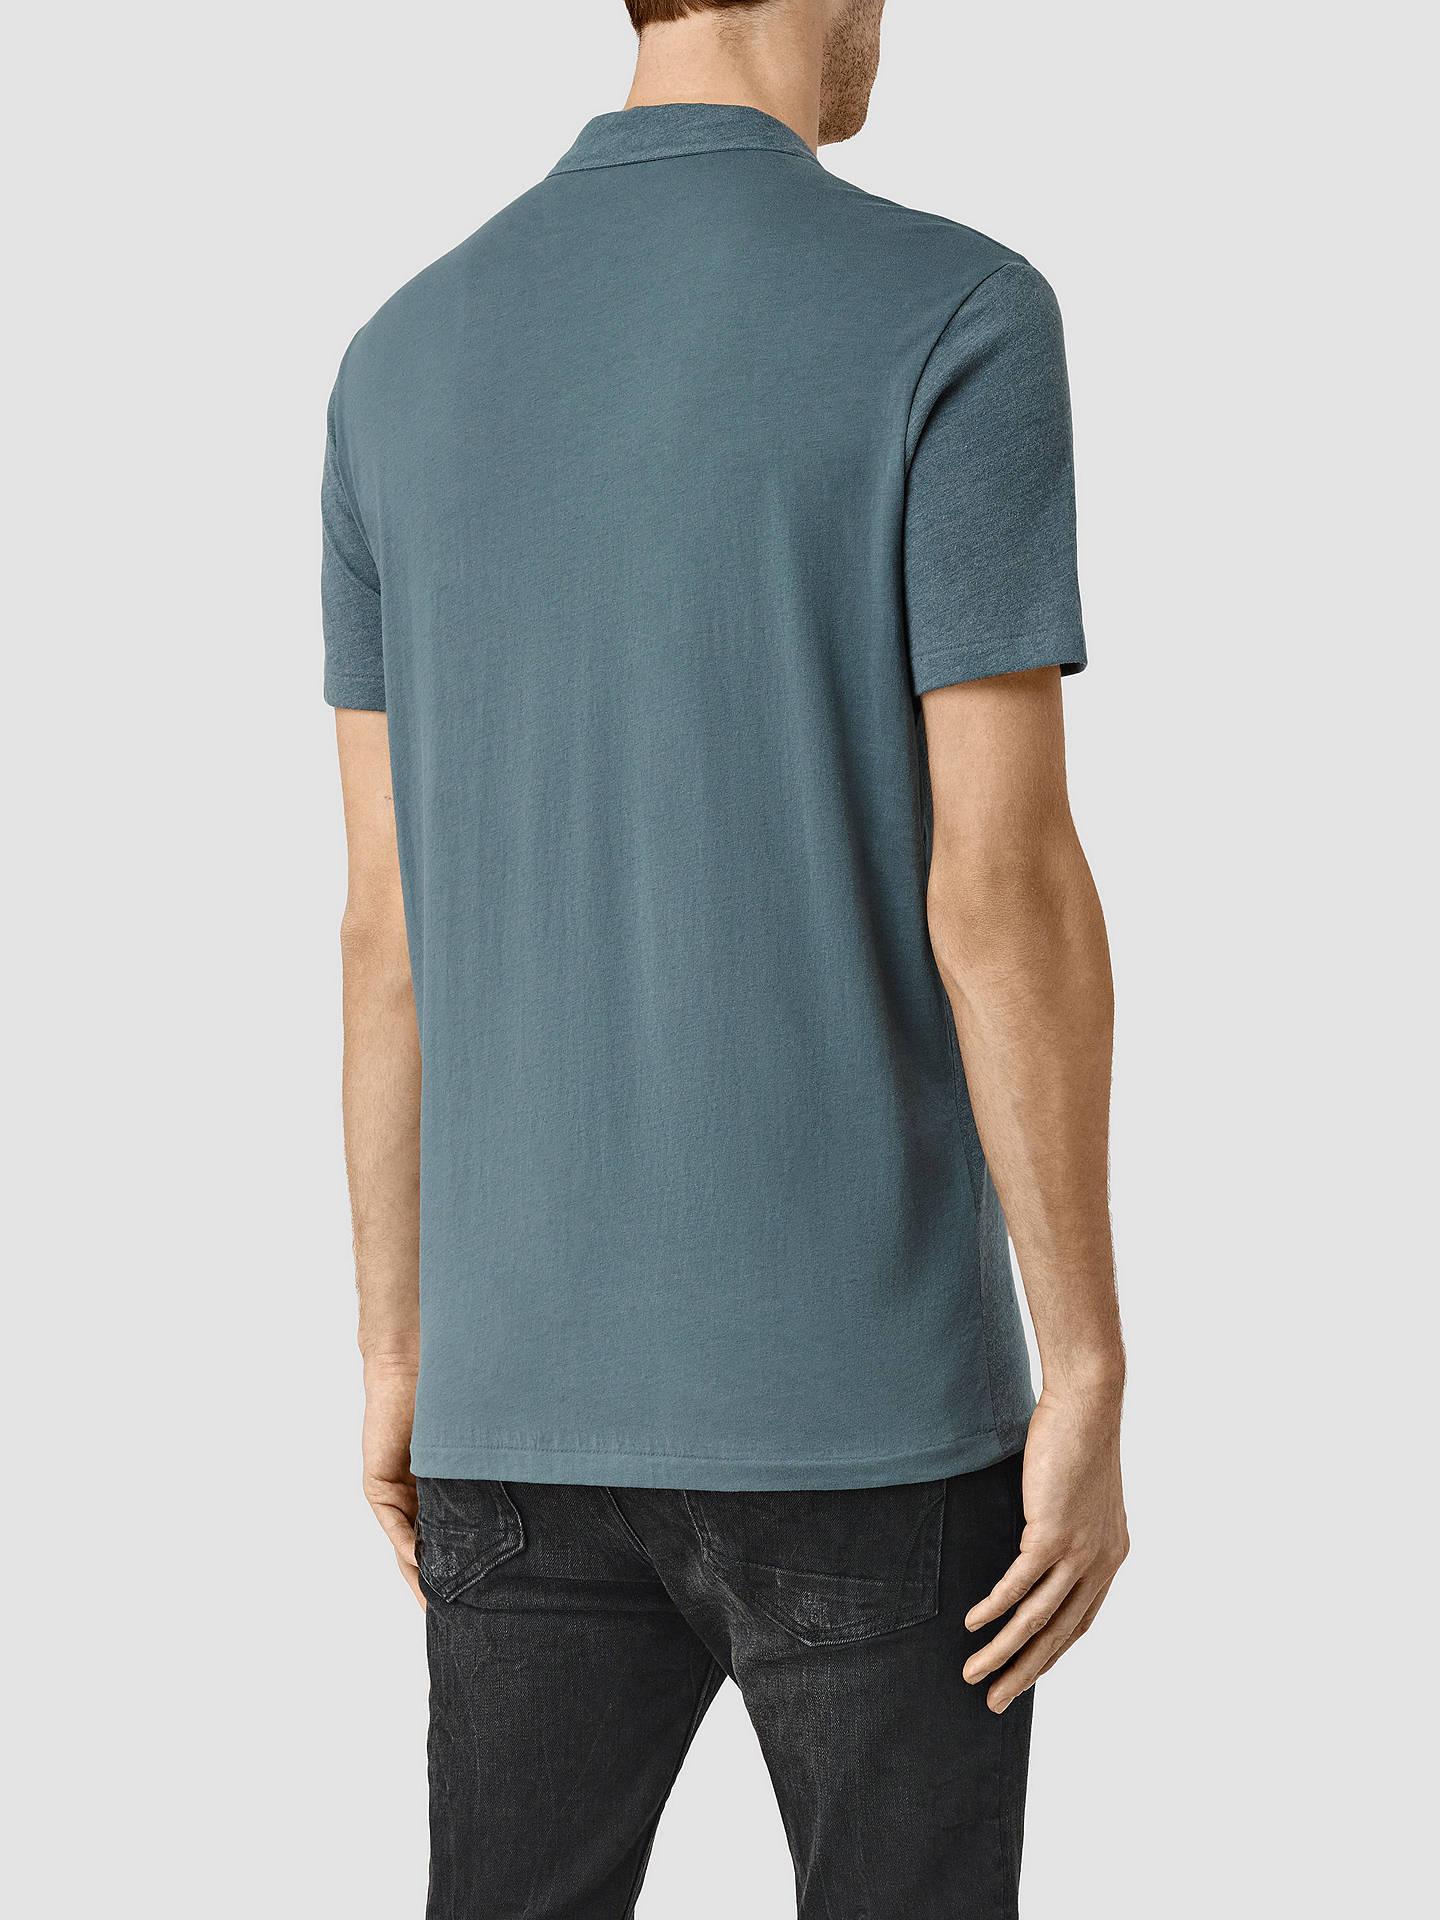 am besten bewertet neuesten niedrigster Rabatt attraktiver Preis AllSaints Tonic Panel Polo Shirt at John Lewis & Partners